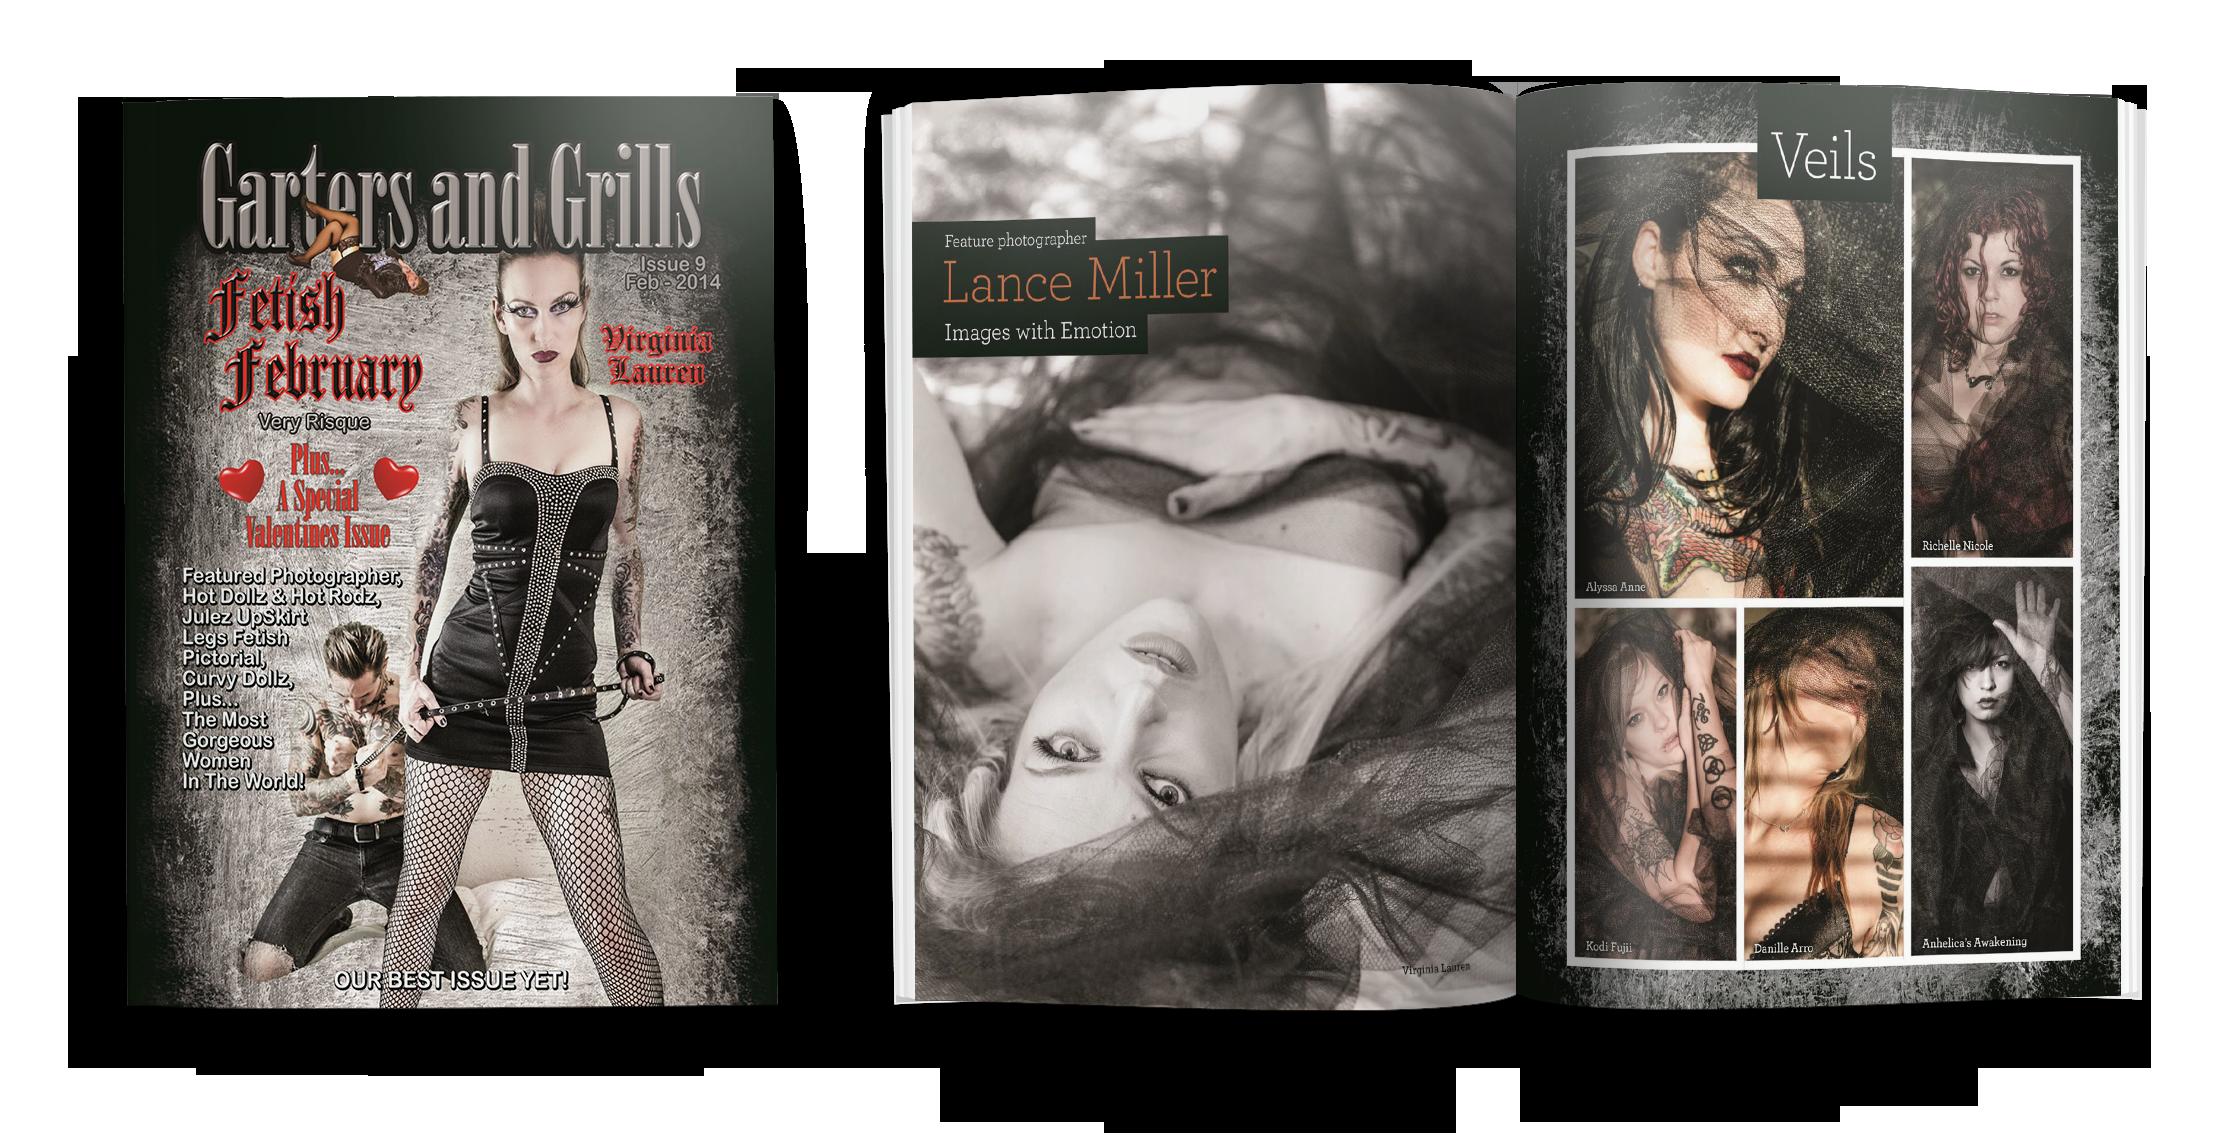 garters_and_grills_magazine_gandg_fetish_feb_valentine_issue_render1.png